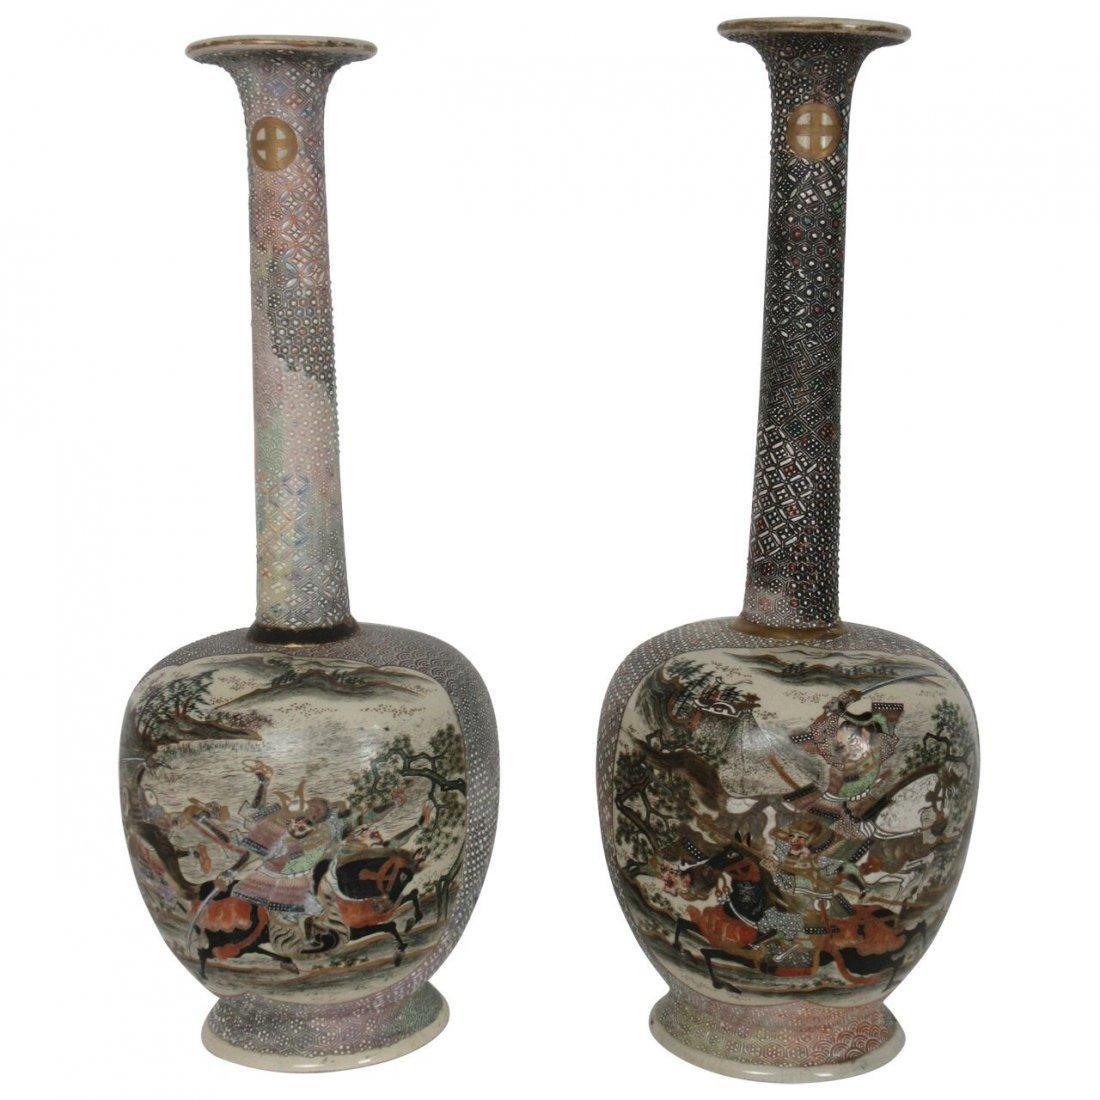 Fine Pair of Japanese Edo Period Bottle Vases